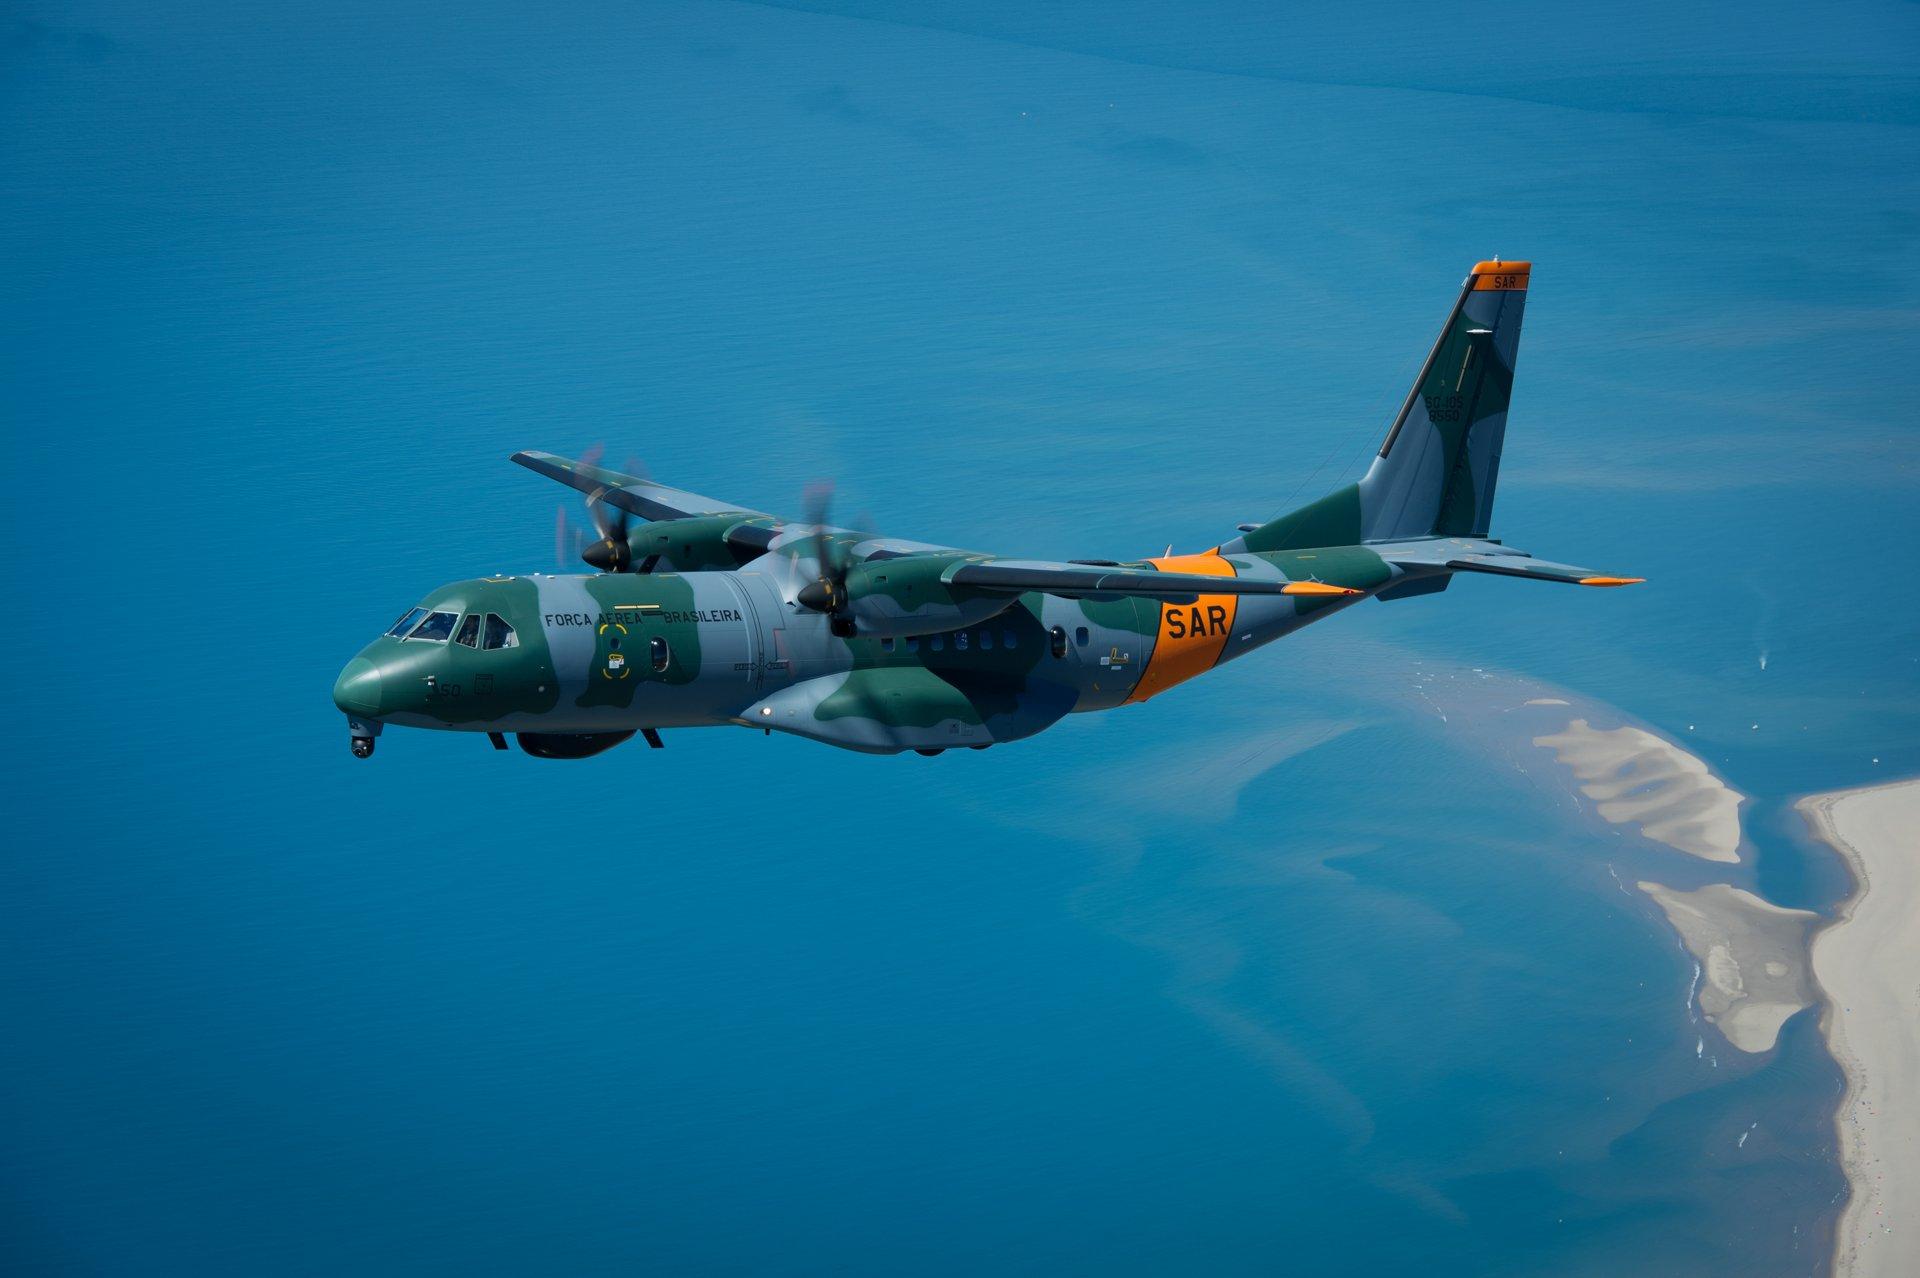 C295 Brazilian Air Force